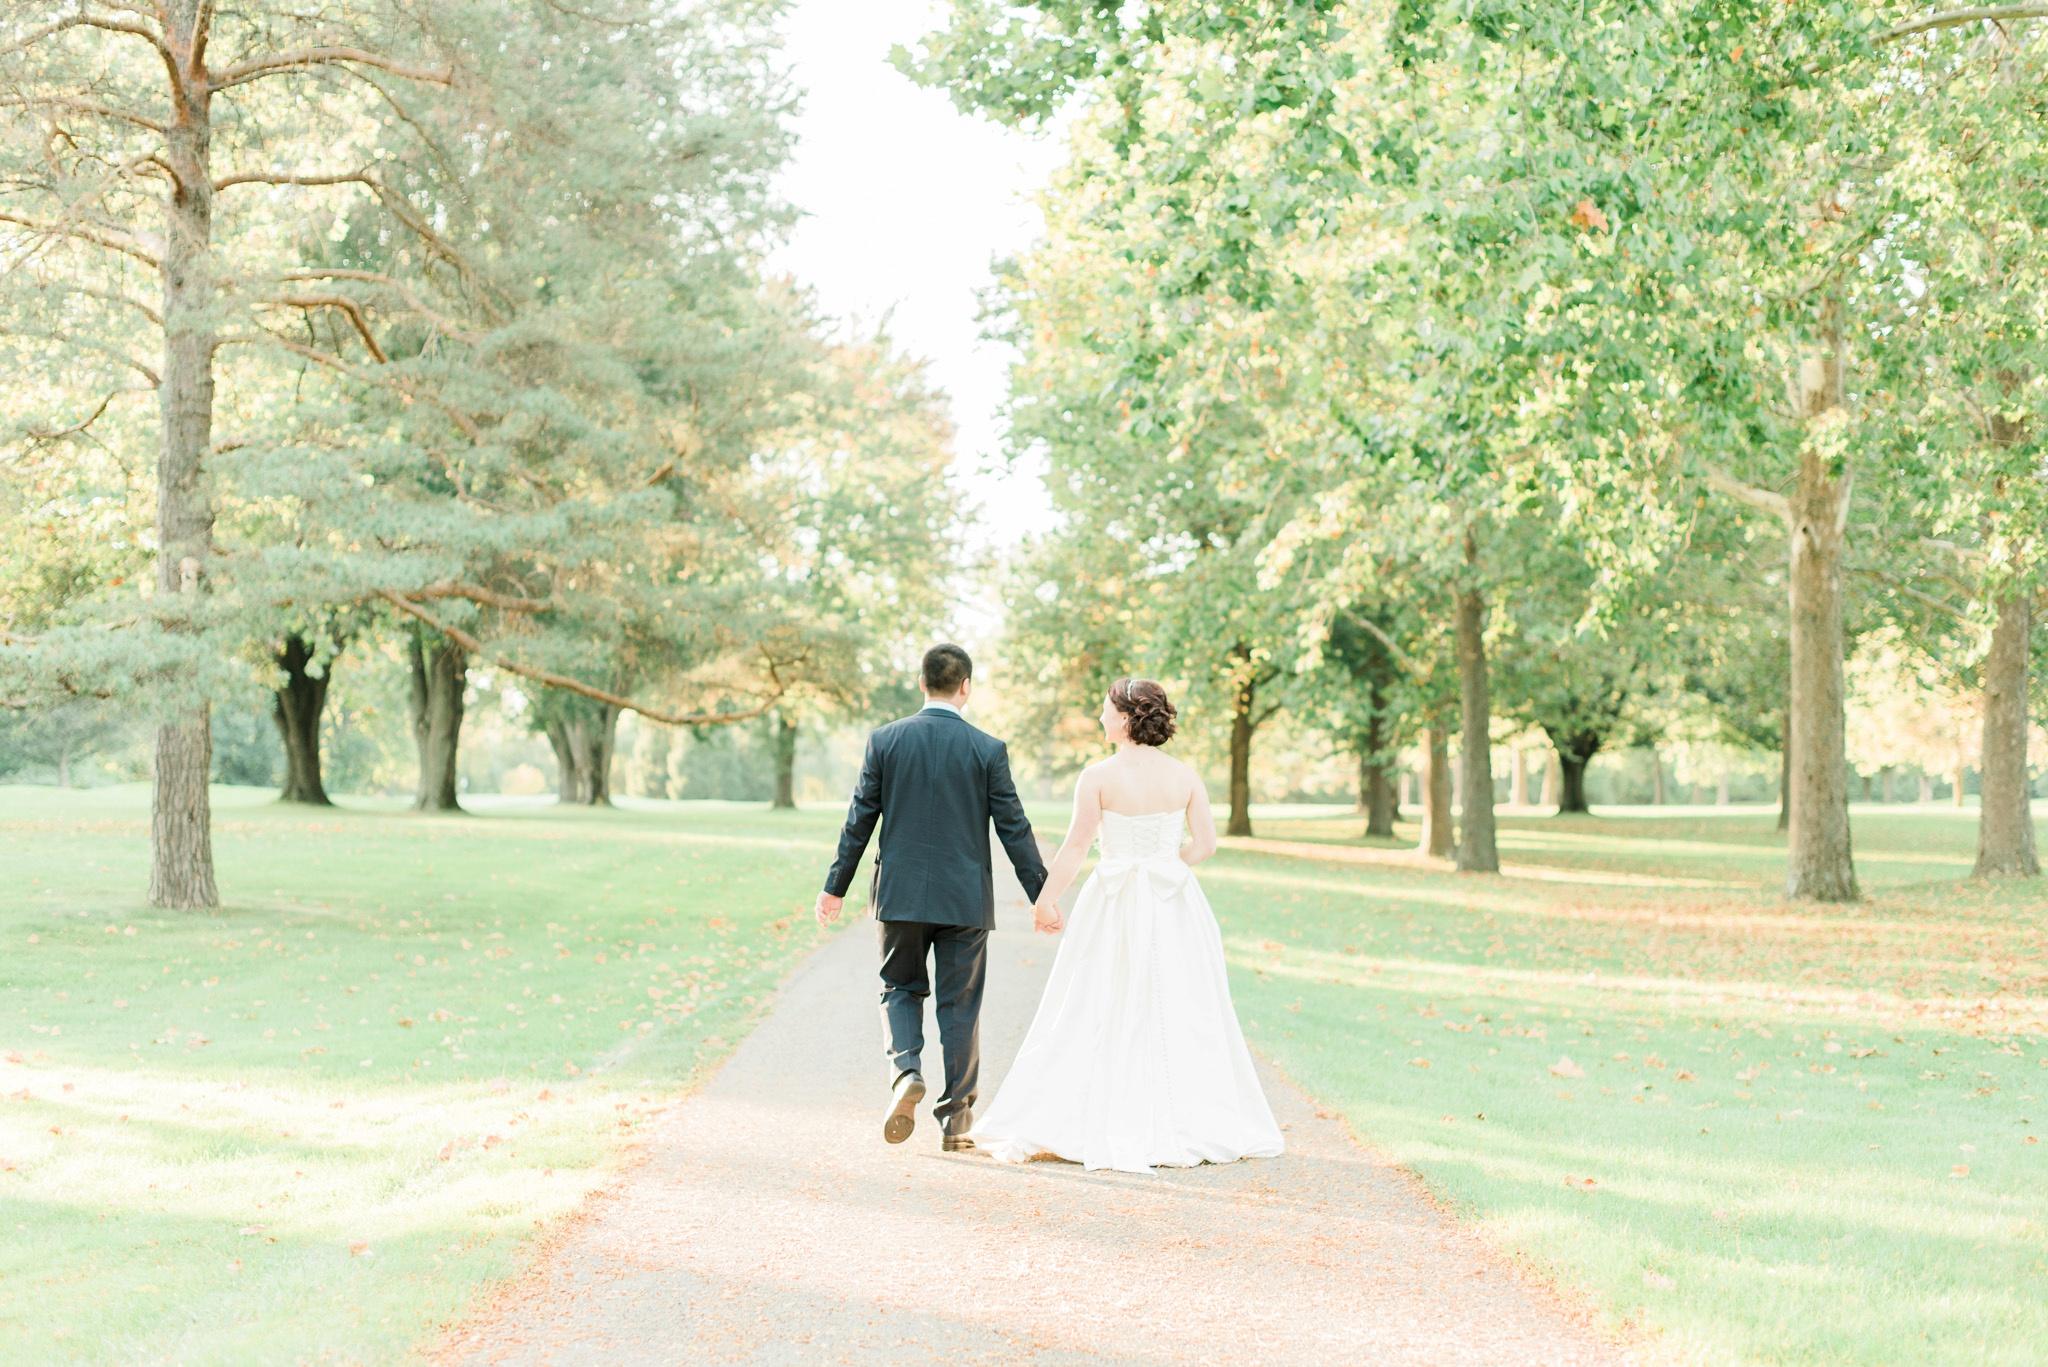 brookside-golf-country-club-wedding-columbus-ohio-115.jpg